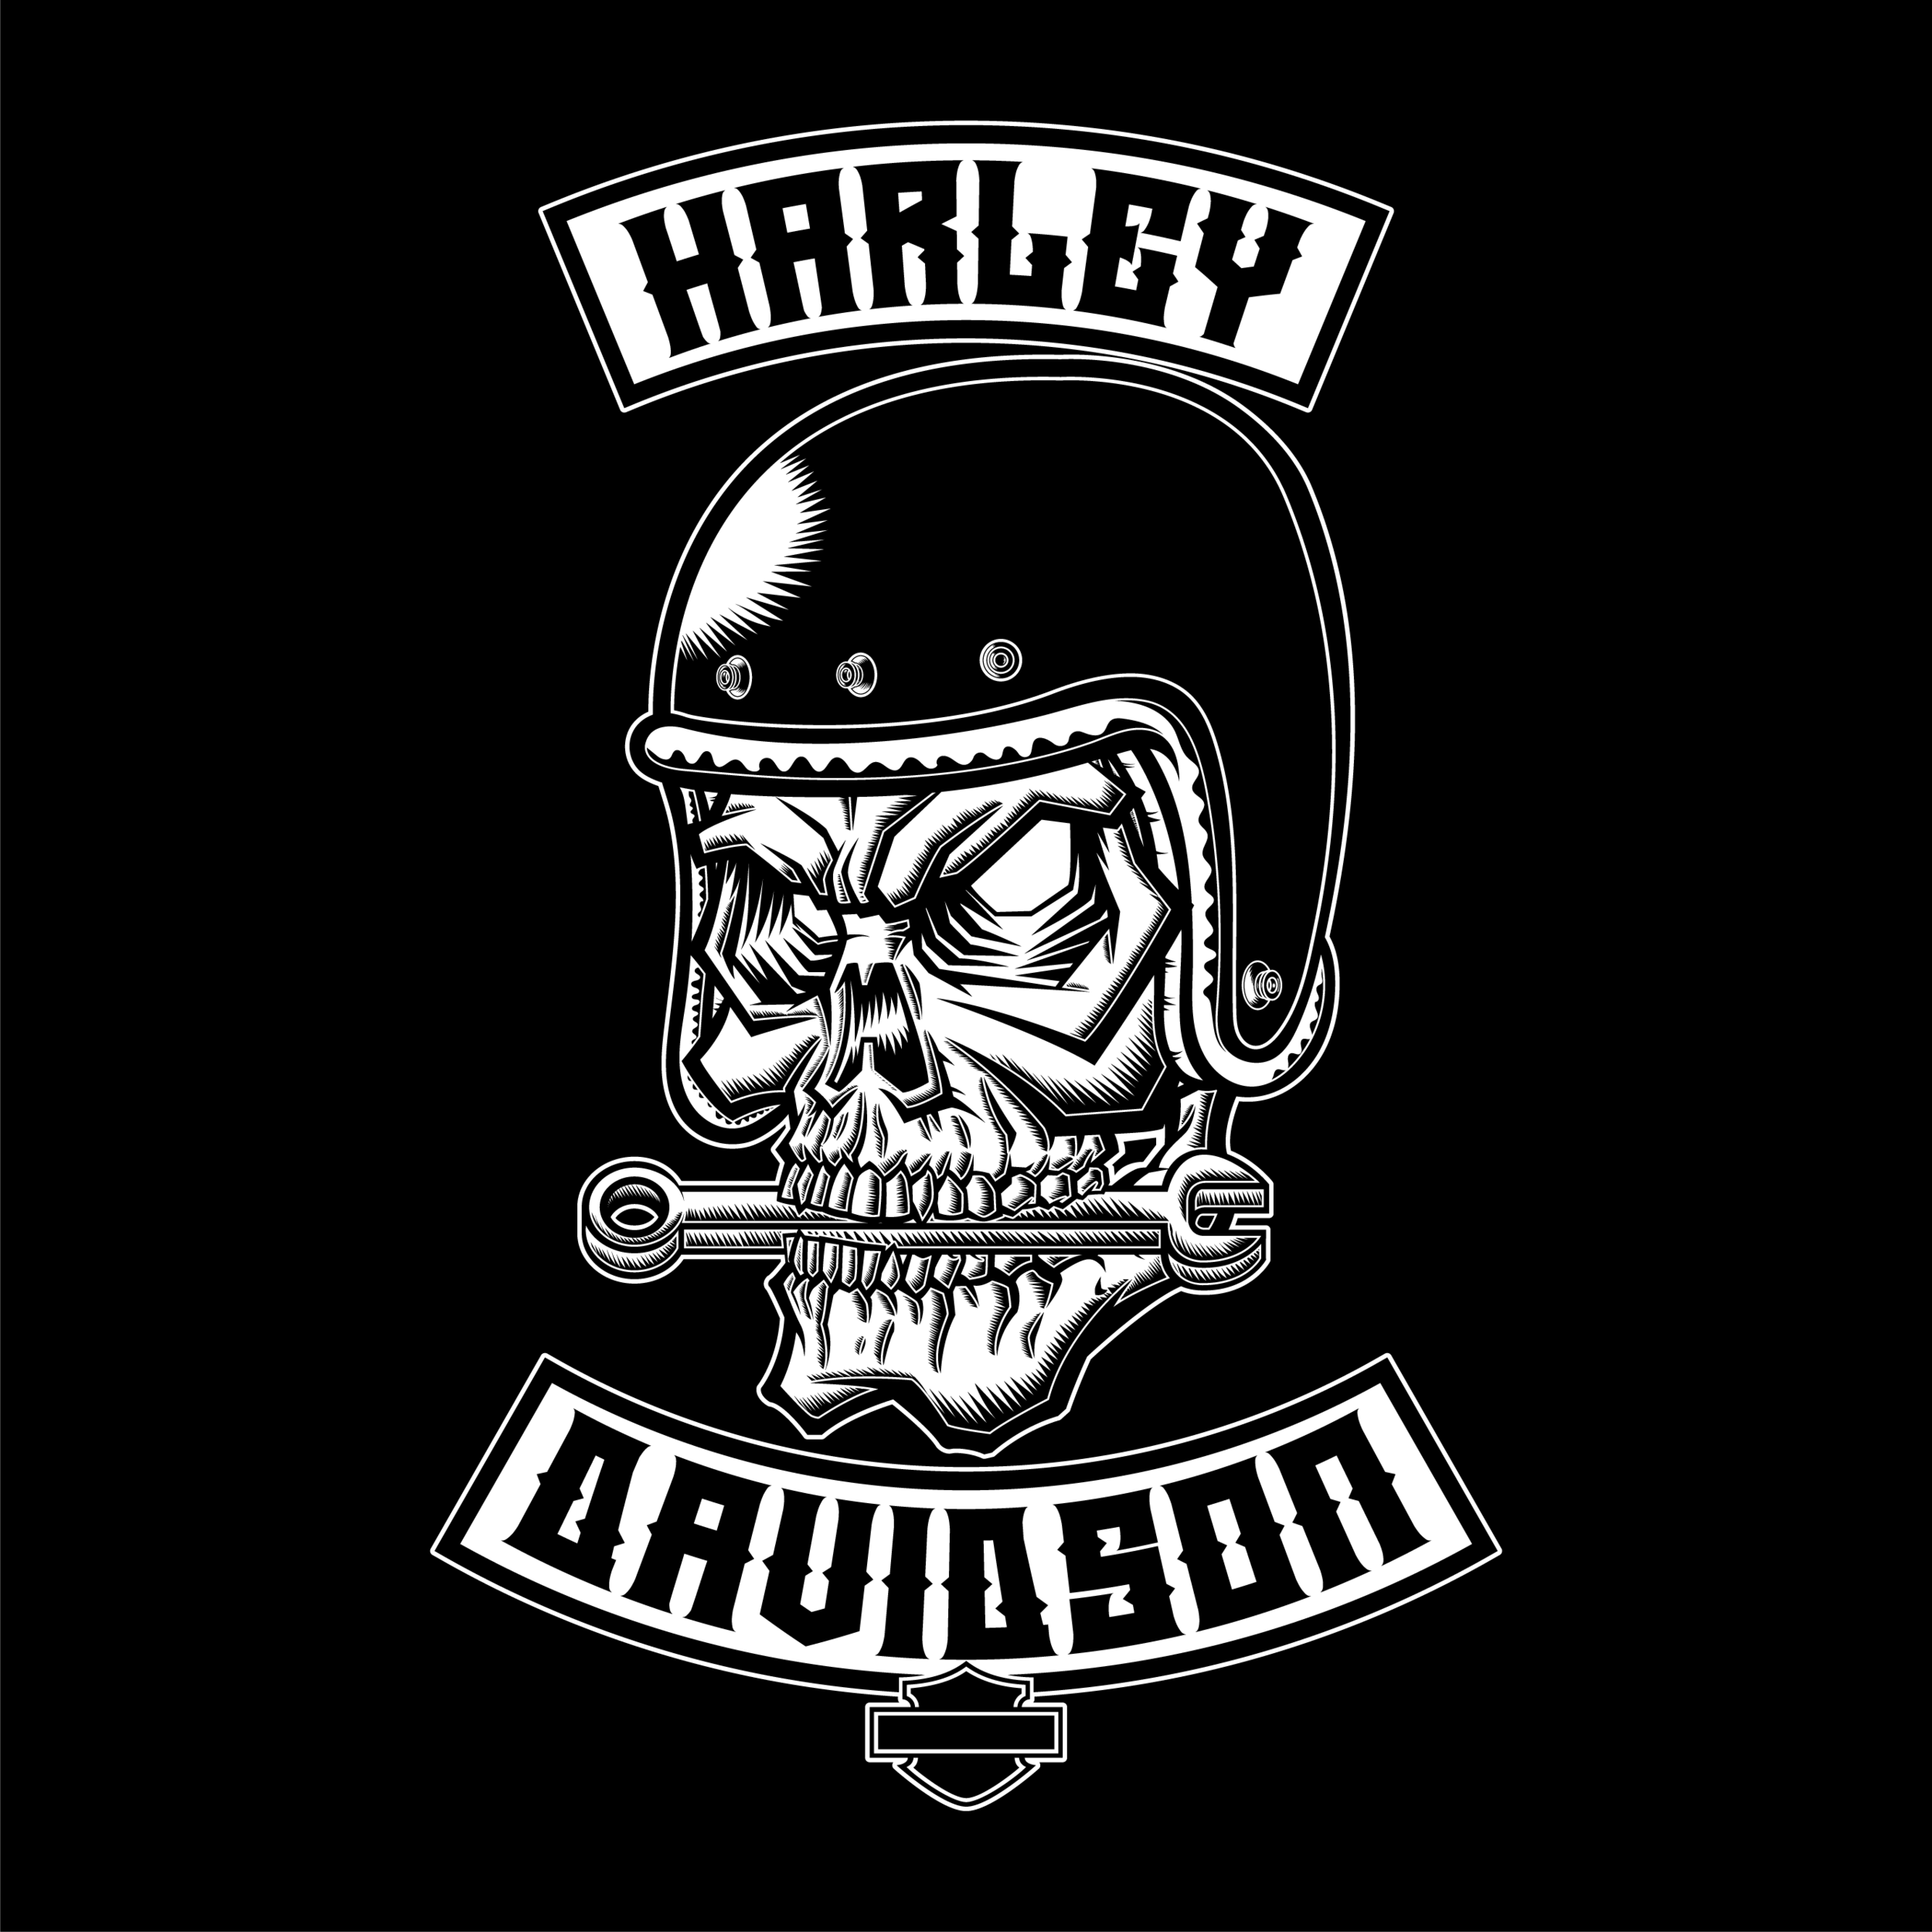 harleydavidson-caferacer-skull-motorcycle-harleydavidsonart-art-vector-poster-illustration-black-white-orozco-deesign-roberto-artist.jpg